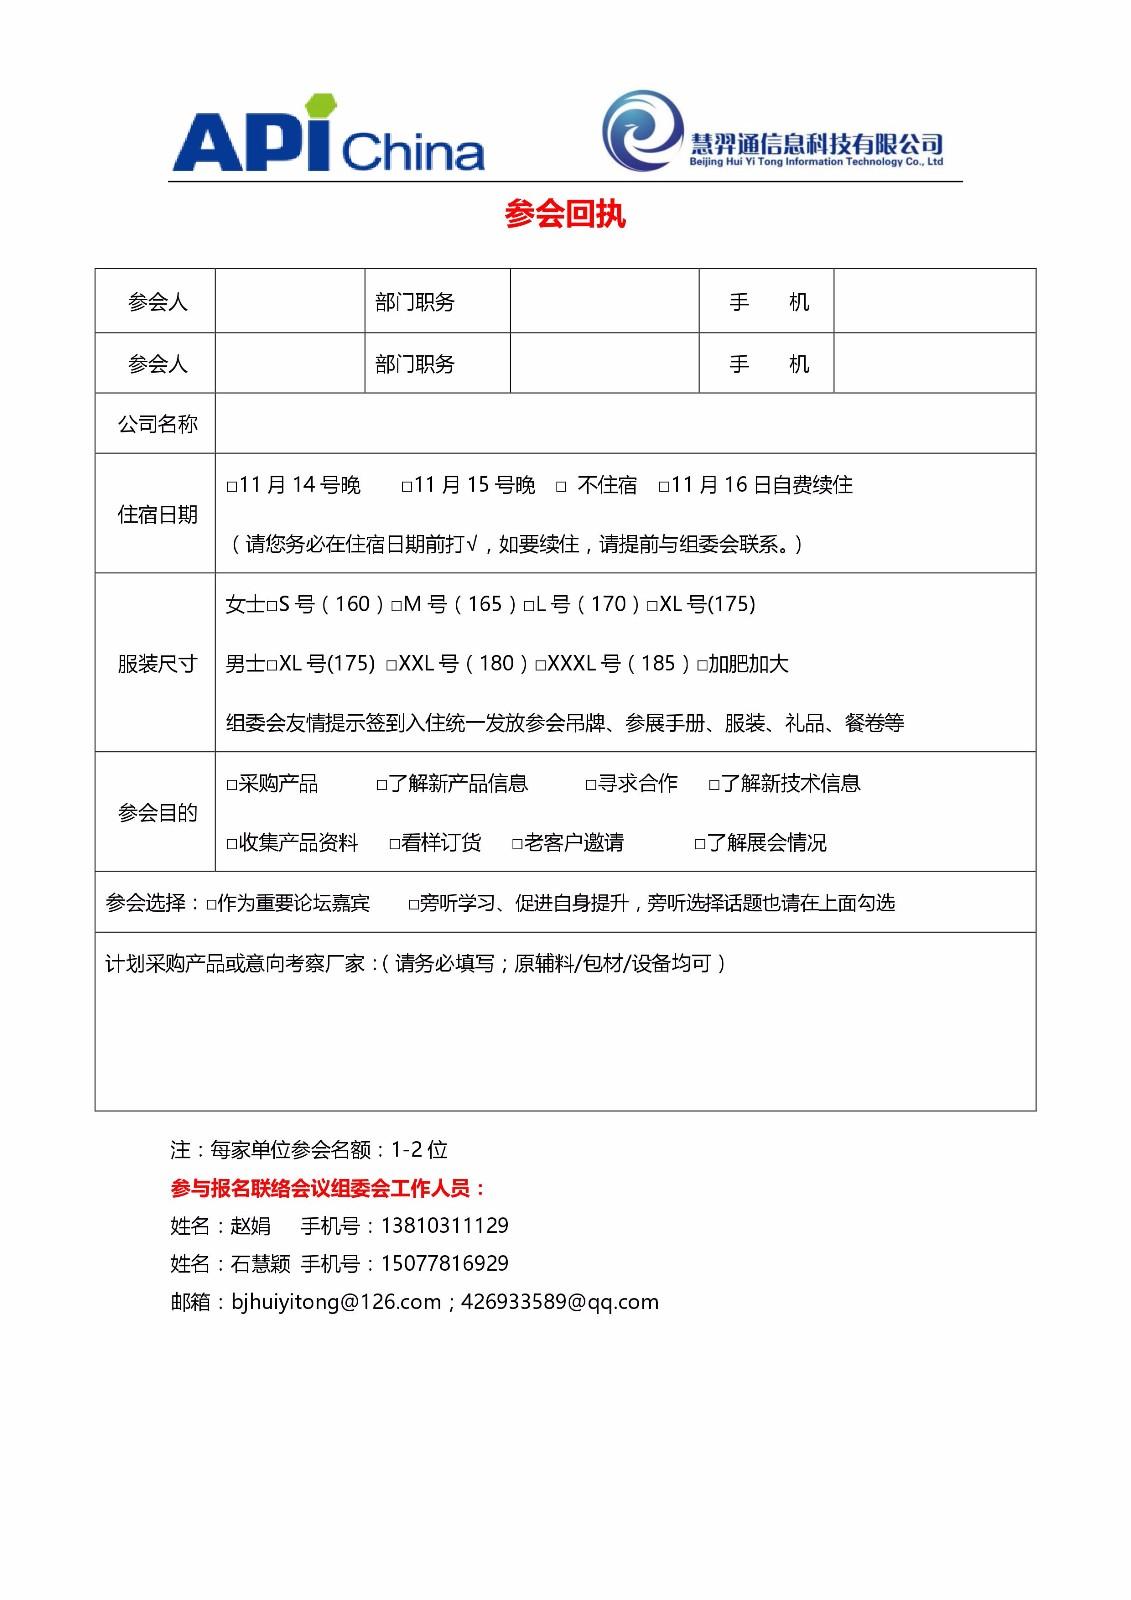 2017 api china慧羿通买家邀请函|单页-慧羿通(北京)信息科技有限公司